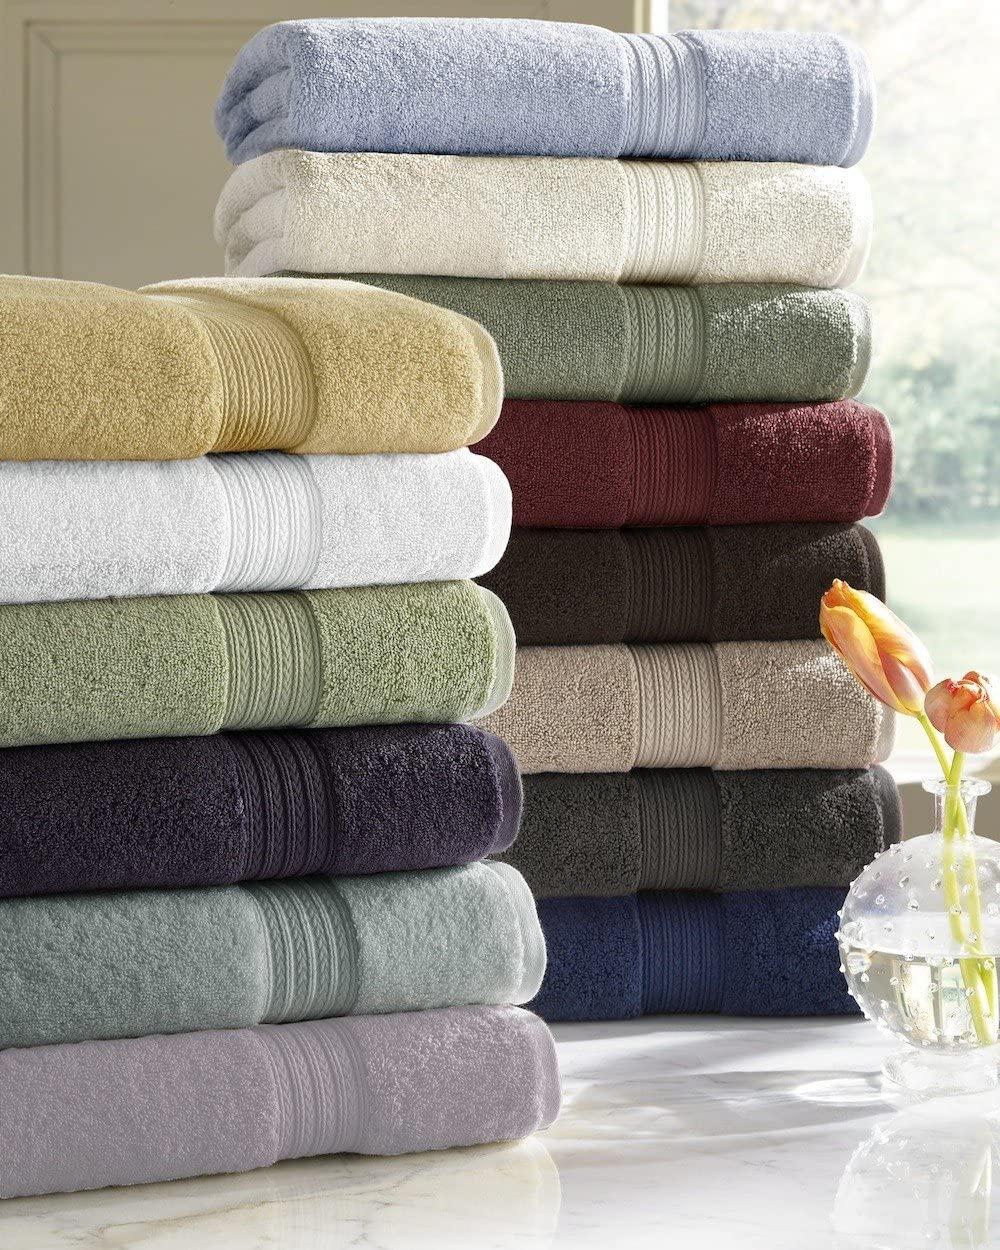 Kassatex Arosa Collection Towels, Bath Towel - Moss